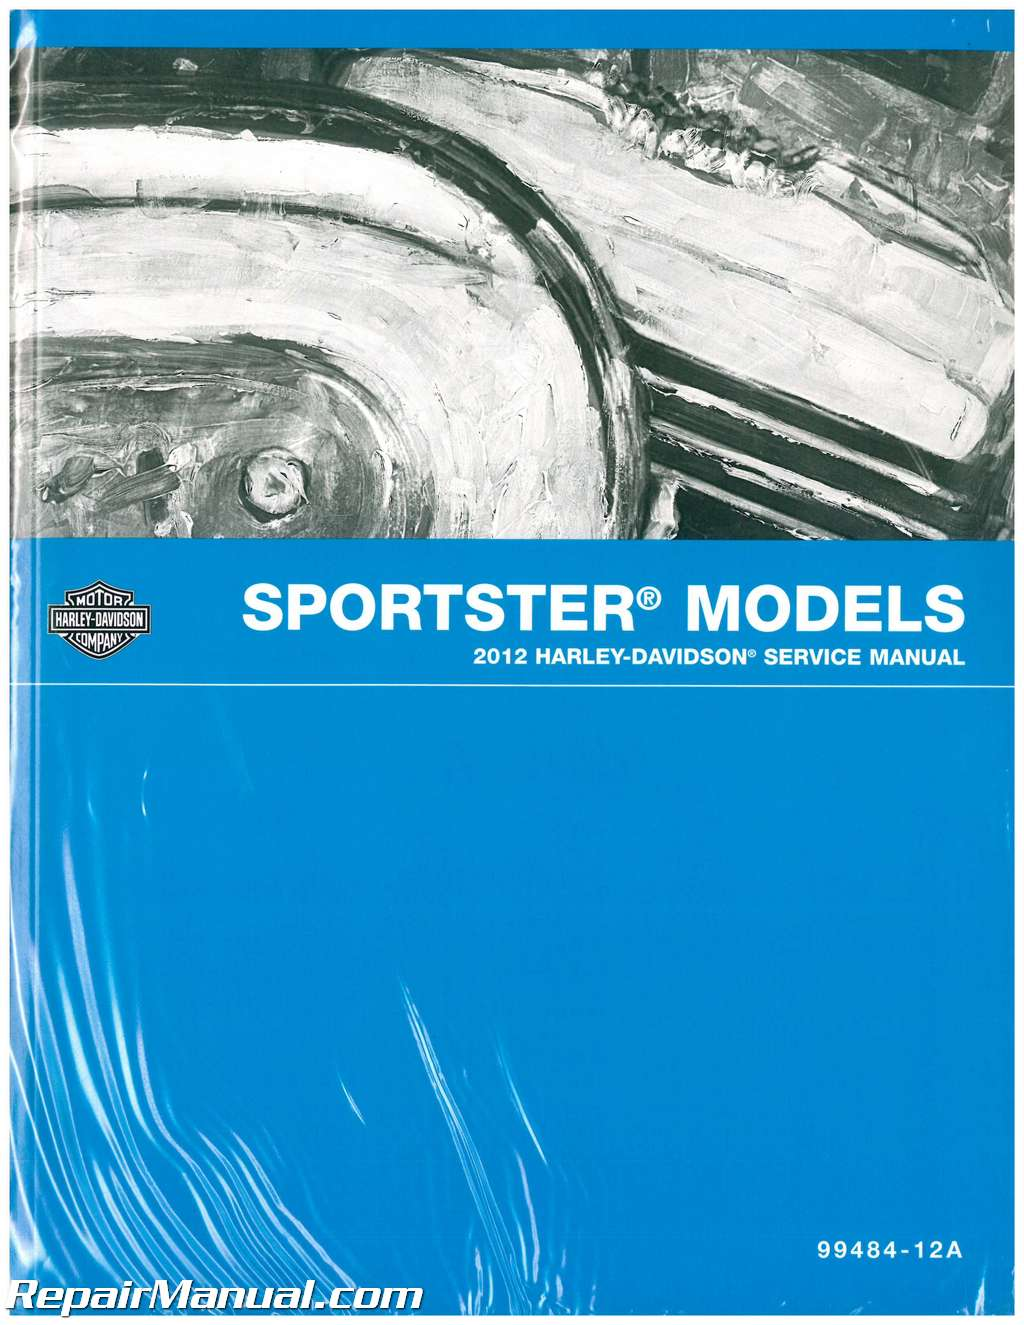 2012 harley davidson sportster motorcycle service manual rh repairmanual com 2014 sportster service manual 2012 sportster service manual pdf